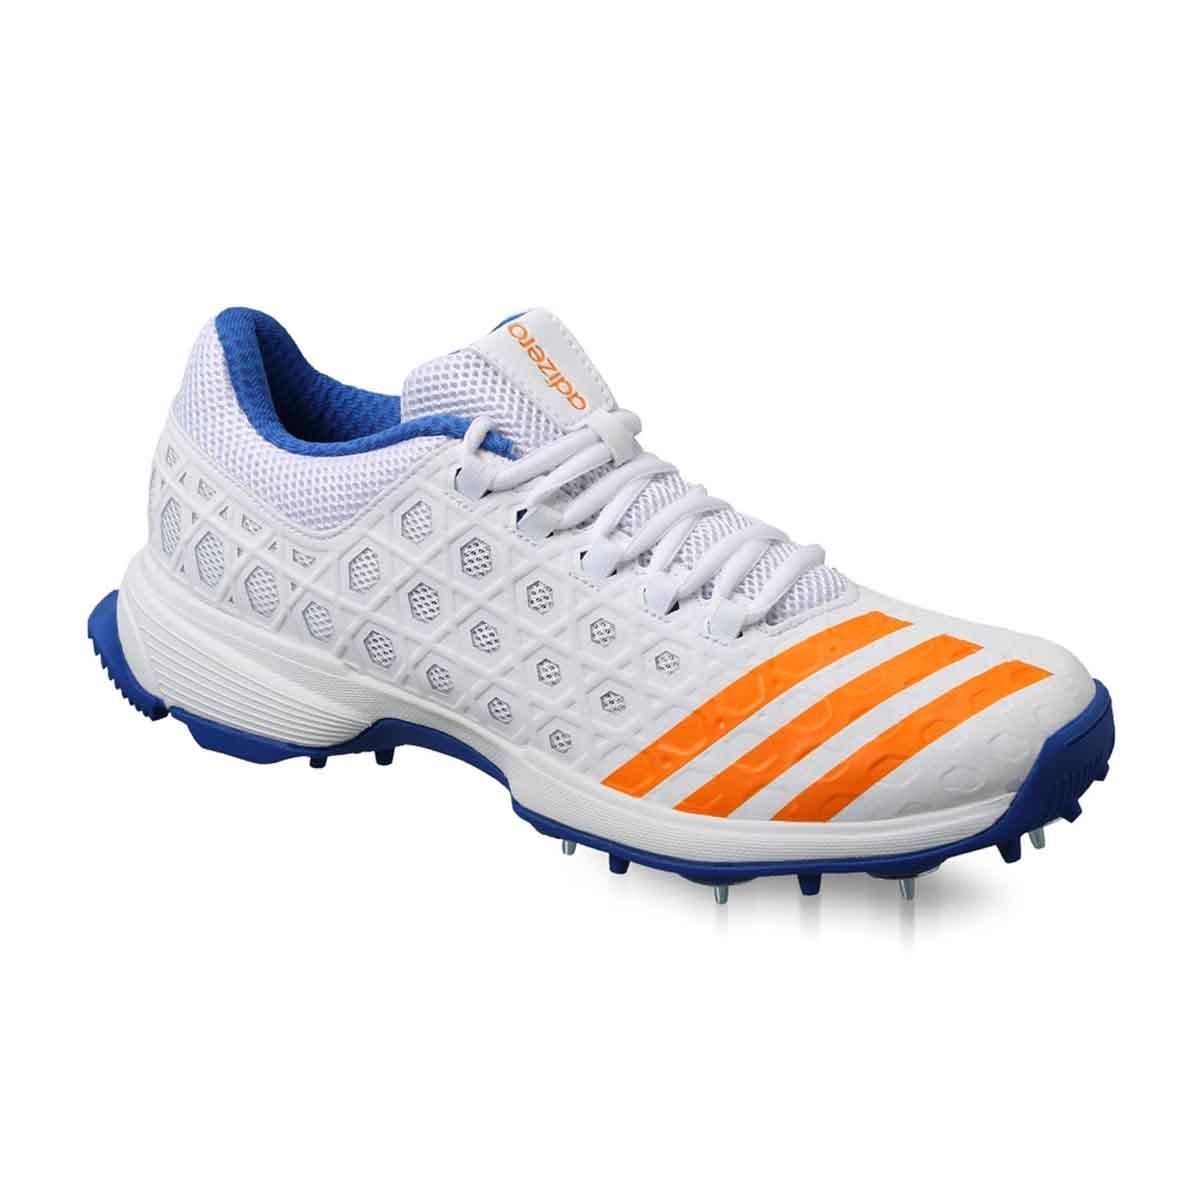 Adidas SL22 Cricket Shoes (White/Blue)